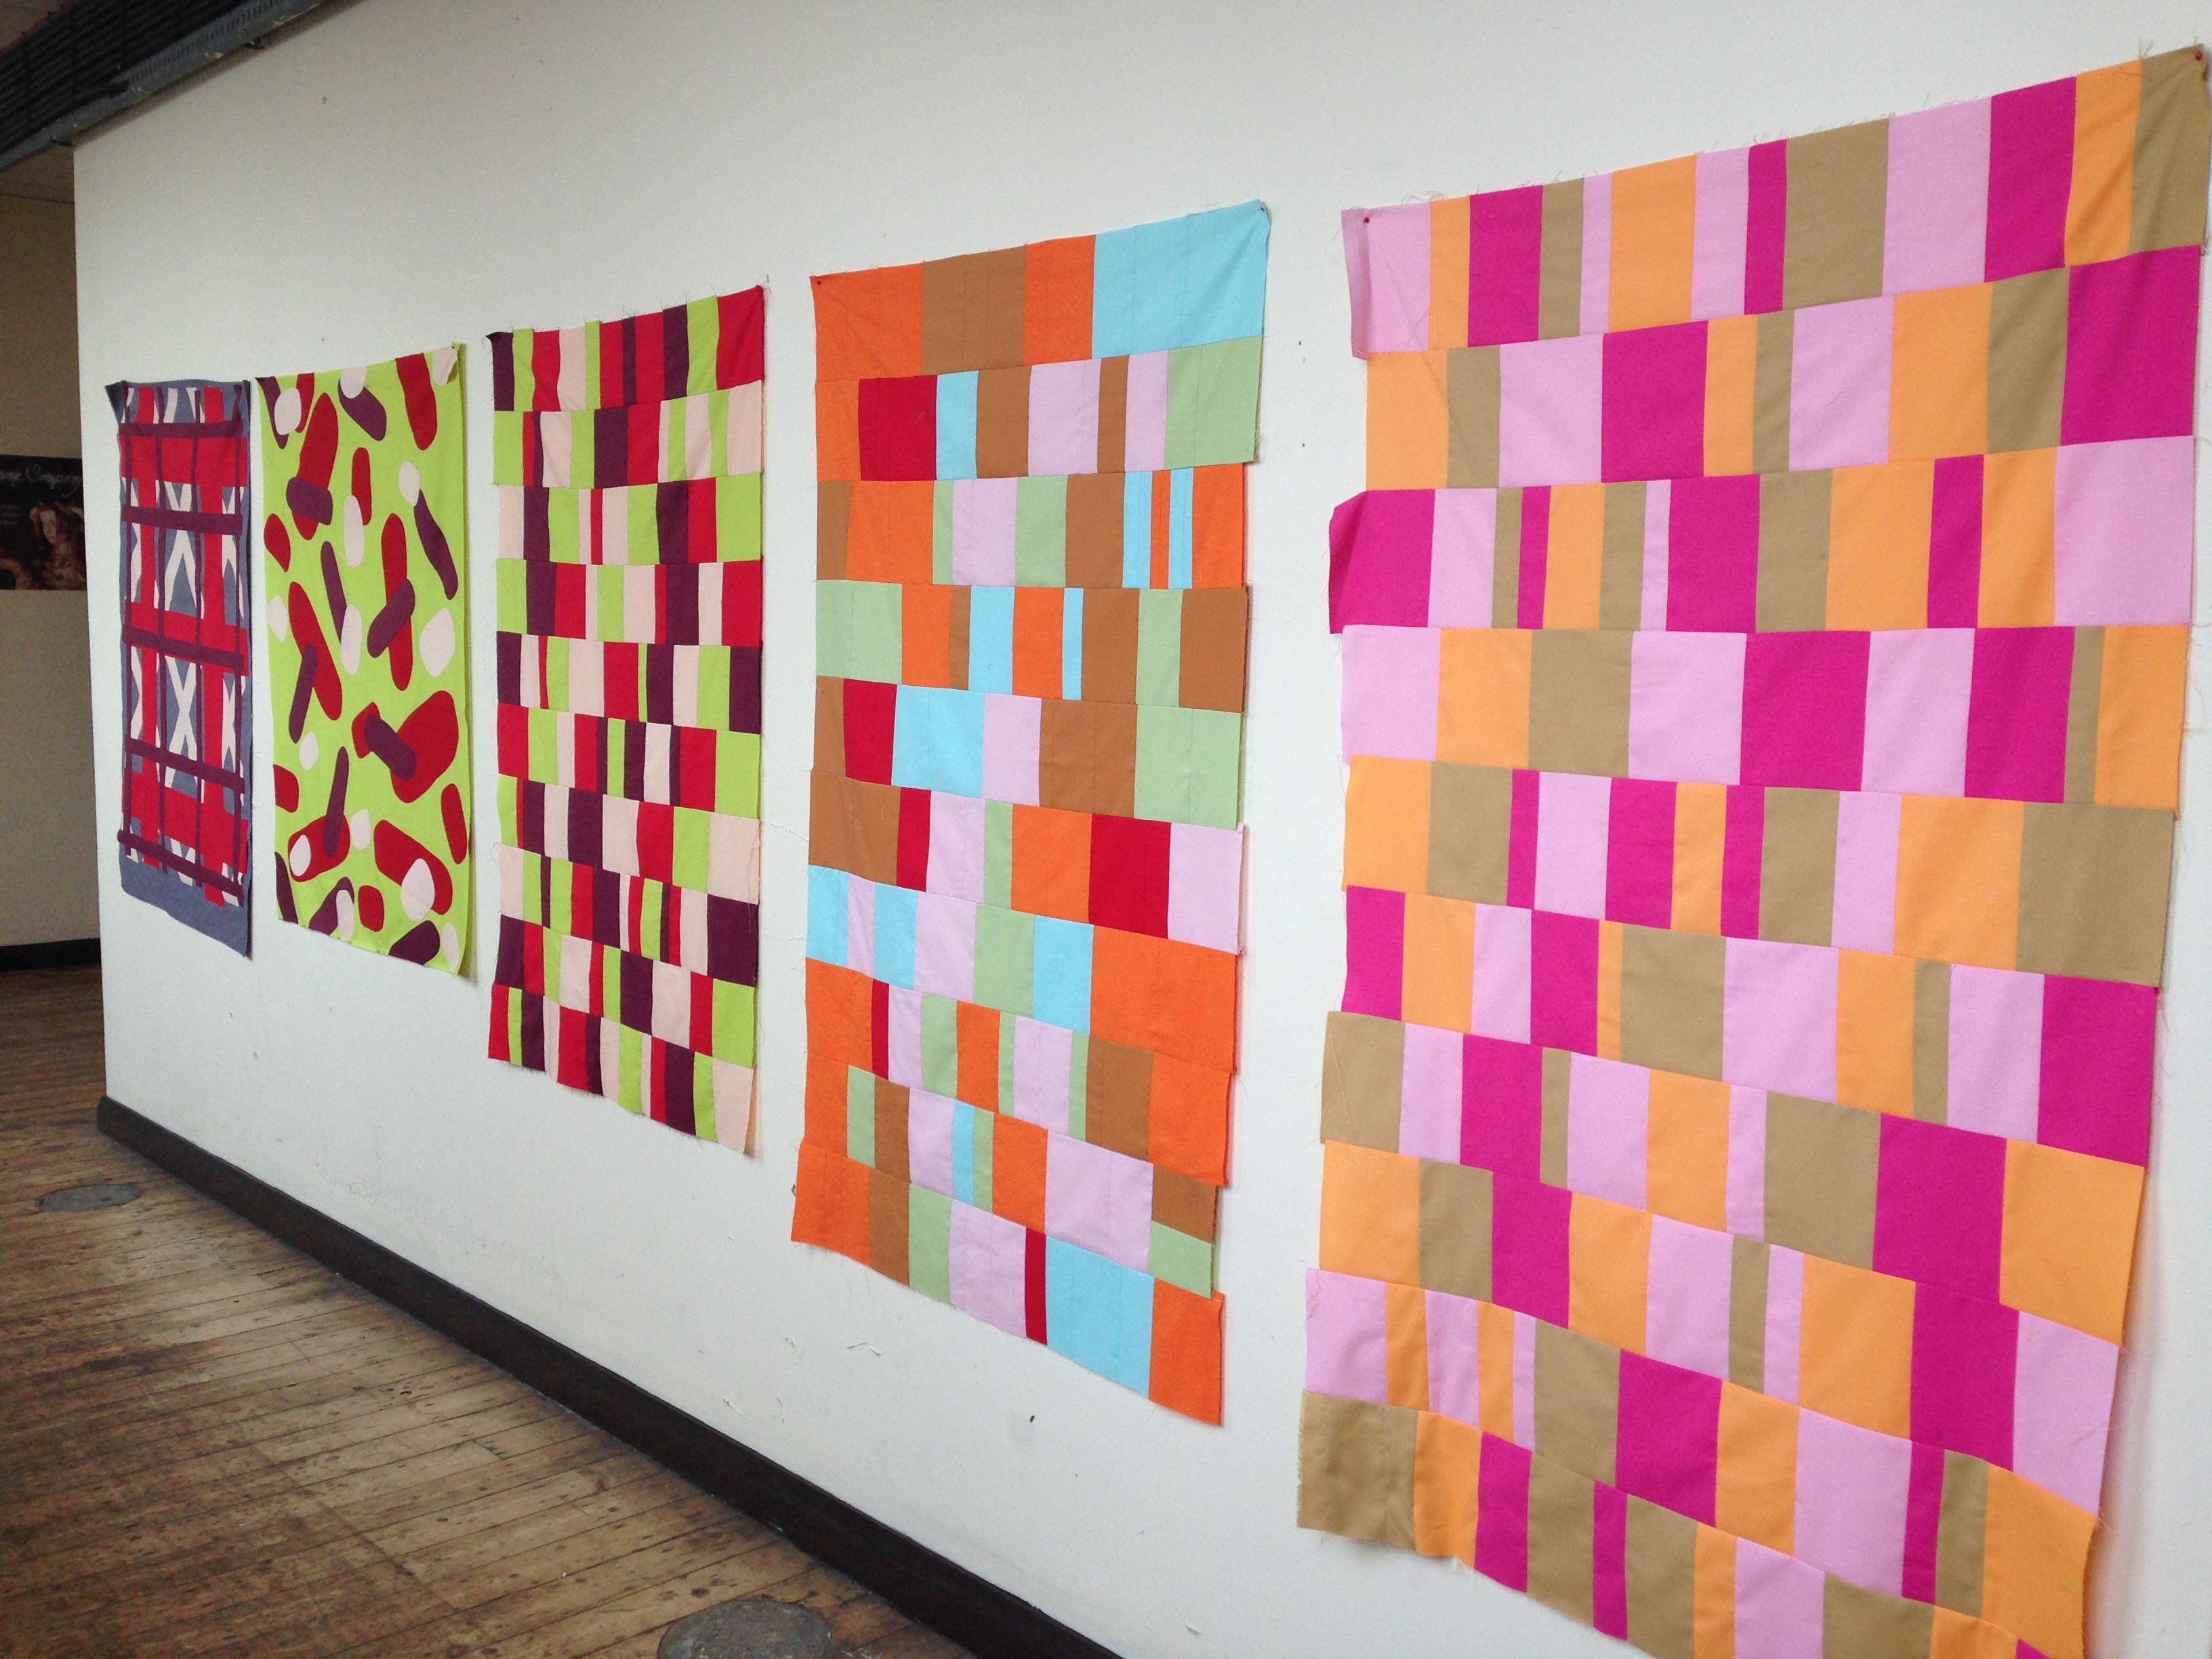 Laura McCafferty, Mishmash-Rehash-Megamix (2017) Textile panels